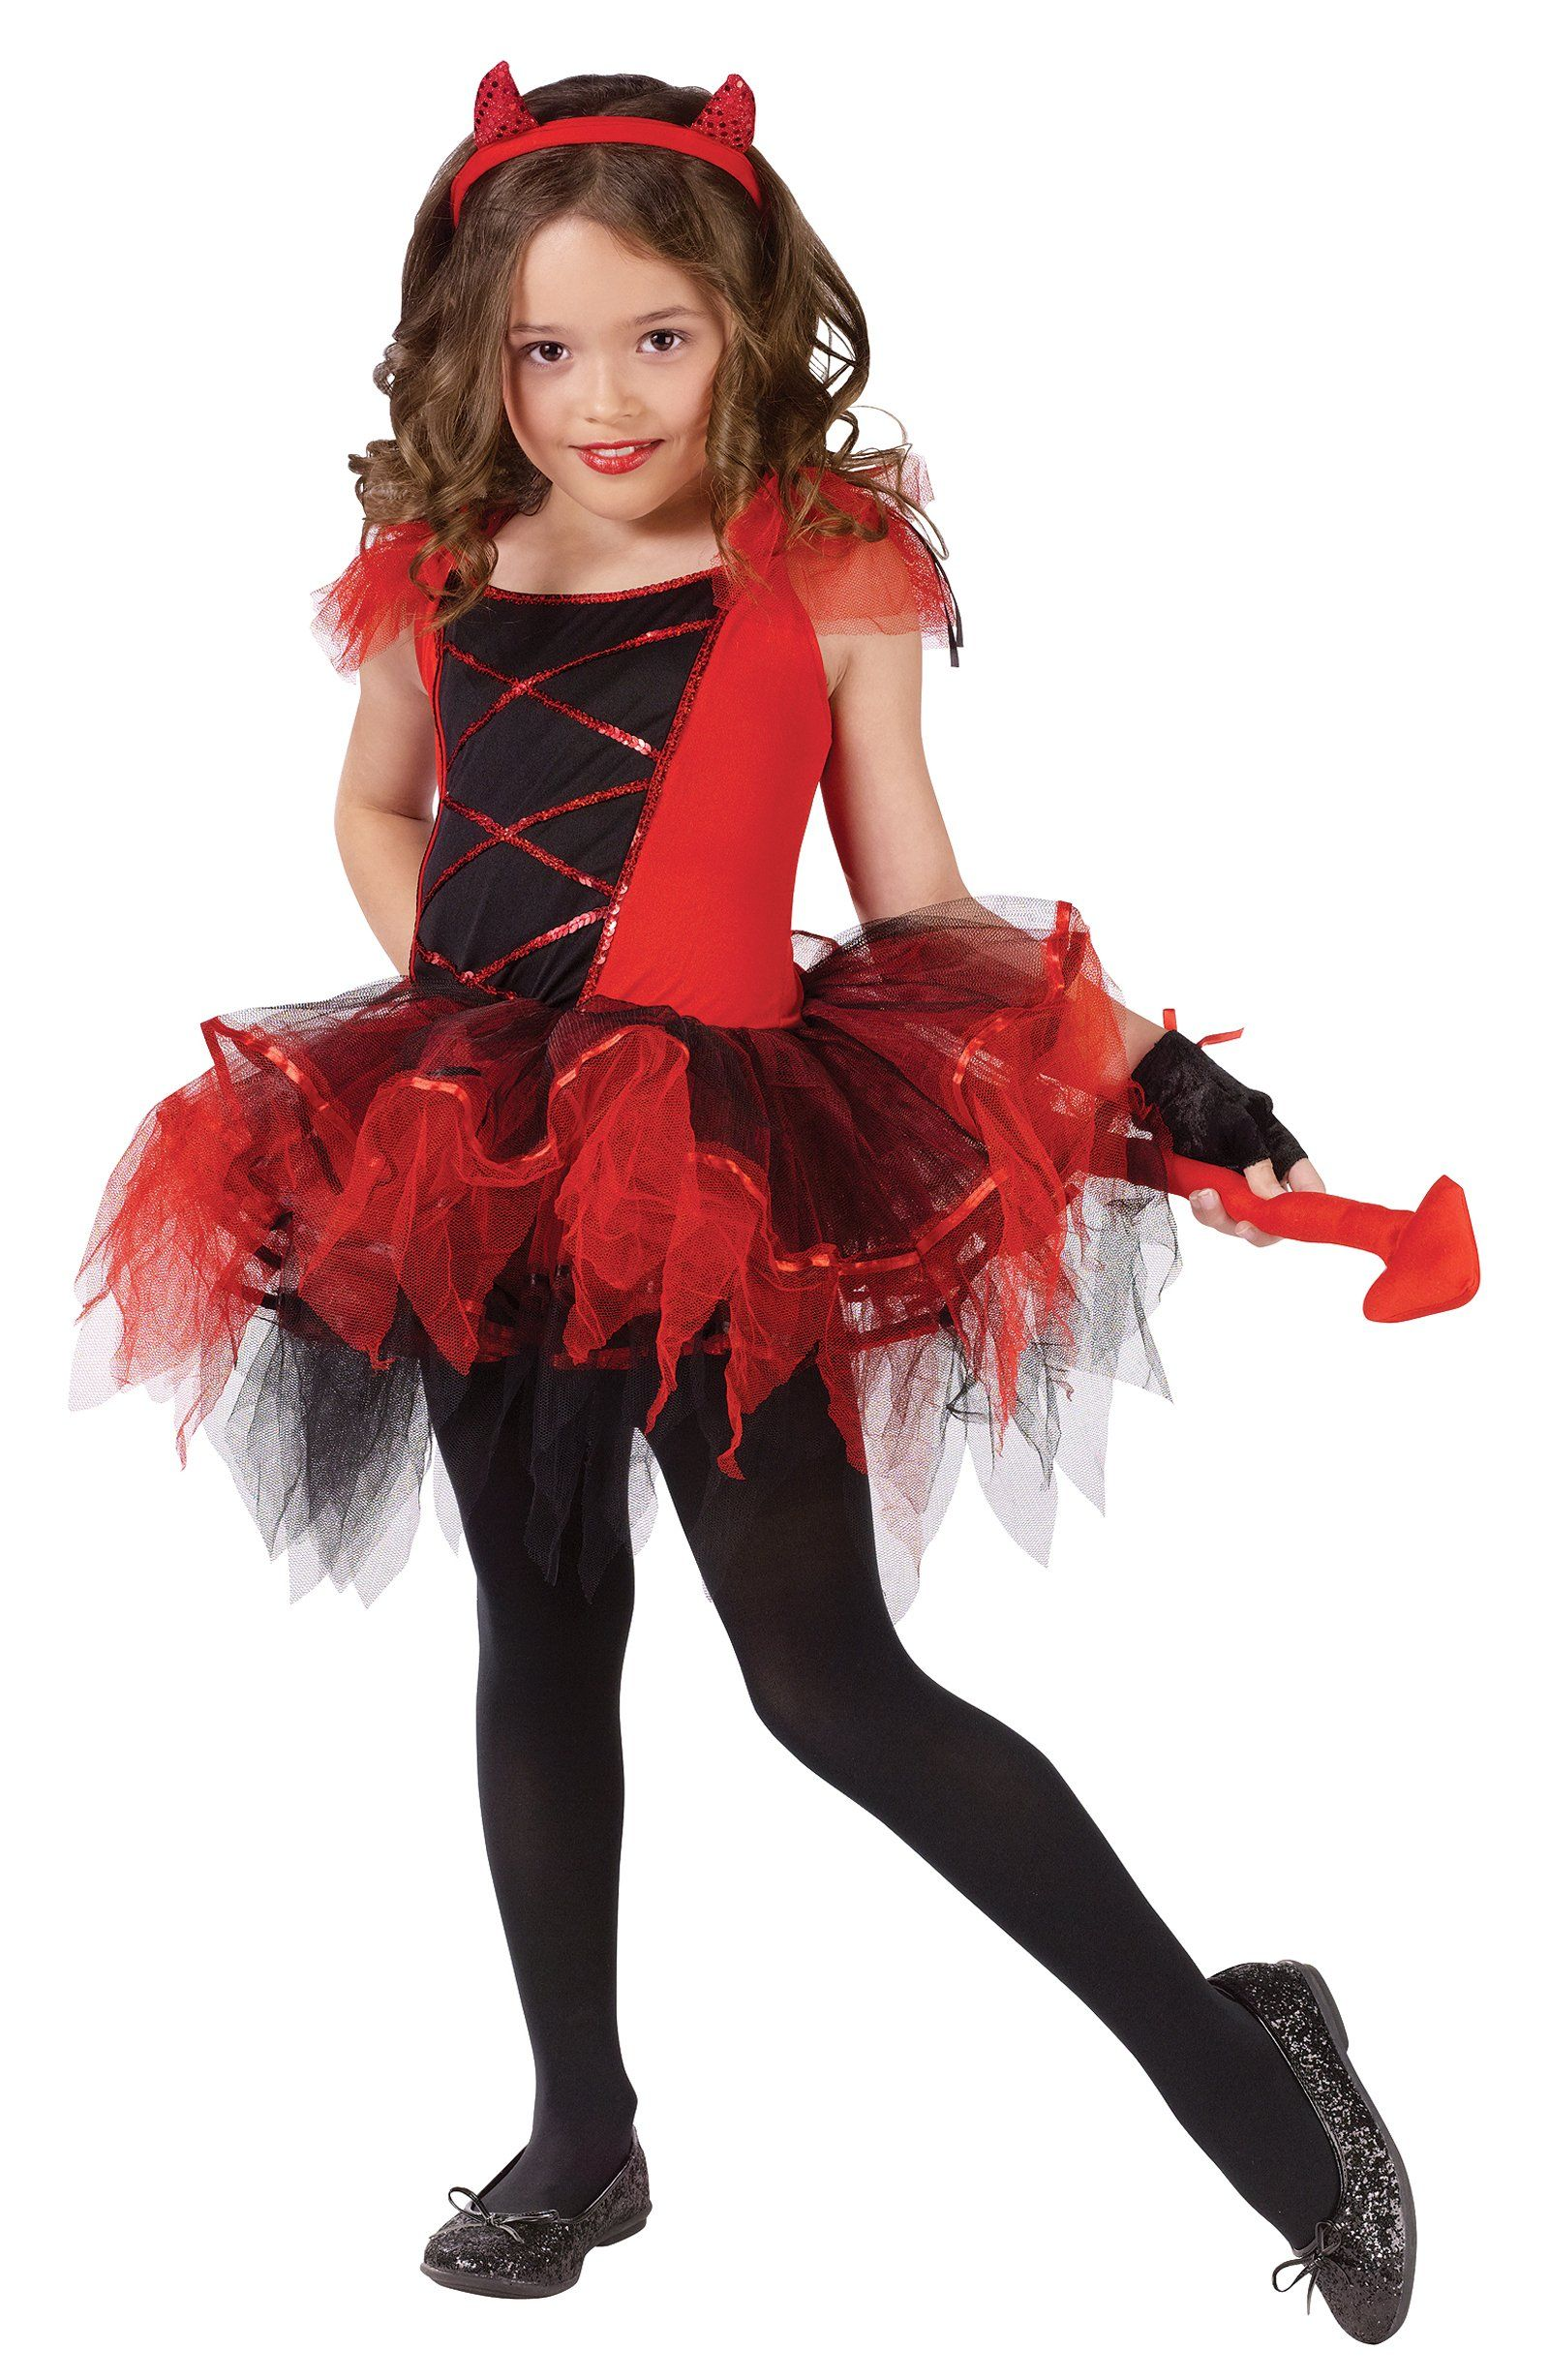 Kids devil costume Play Pinterest Costumes